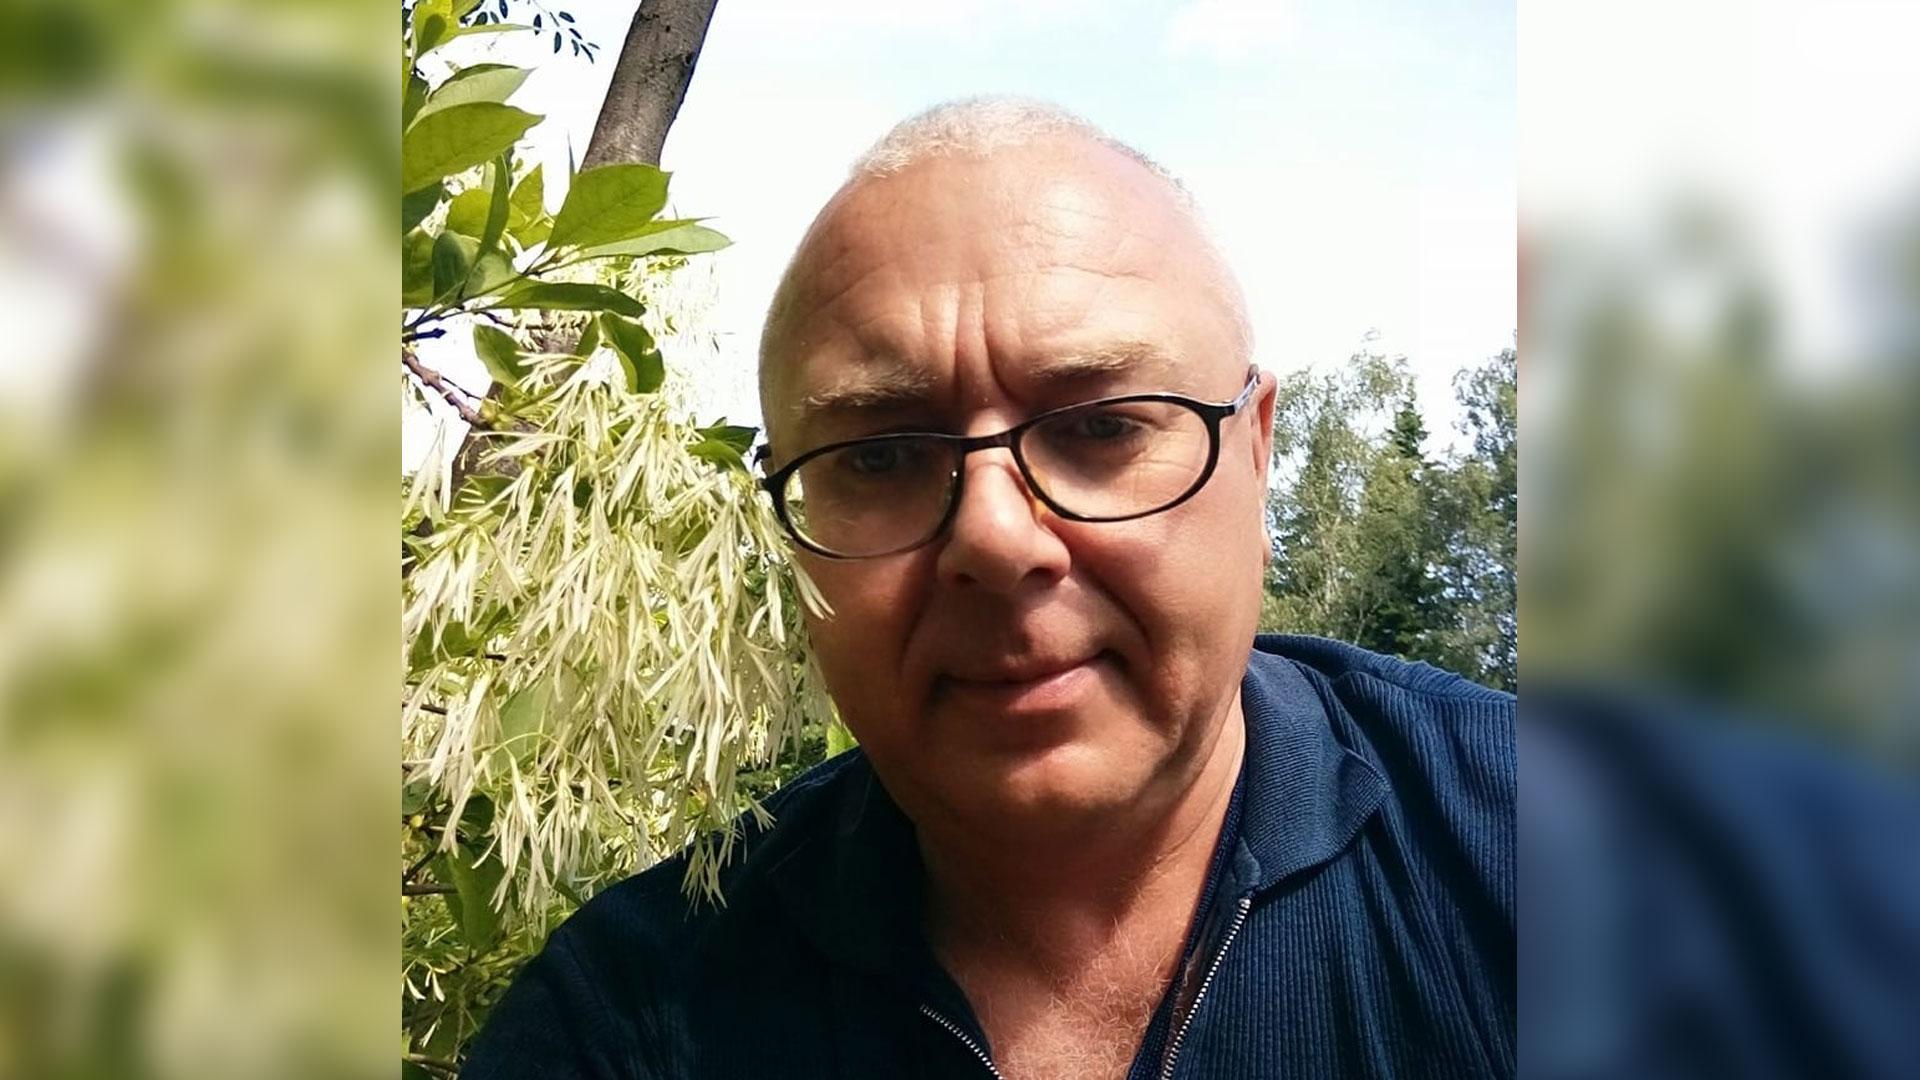 "<p>Фото © Facebook / <a href=""https://www.facebook.com/photo.php?fbid=2544431805590728&set=pb.100000718008098.-2207520000..&type=3"" target=""_blank"" rel=""noopener noreferrer"">Павел Лобков</a></p>"